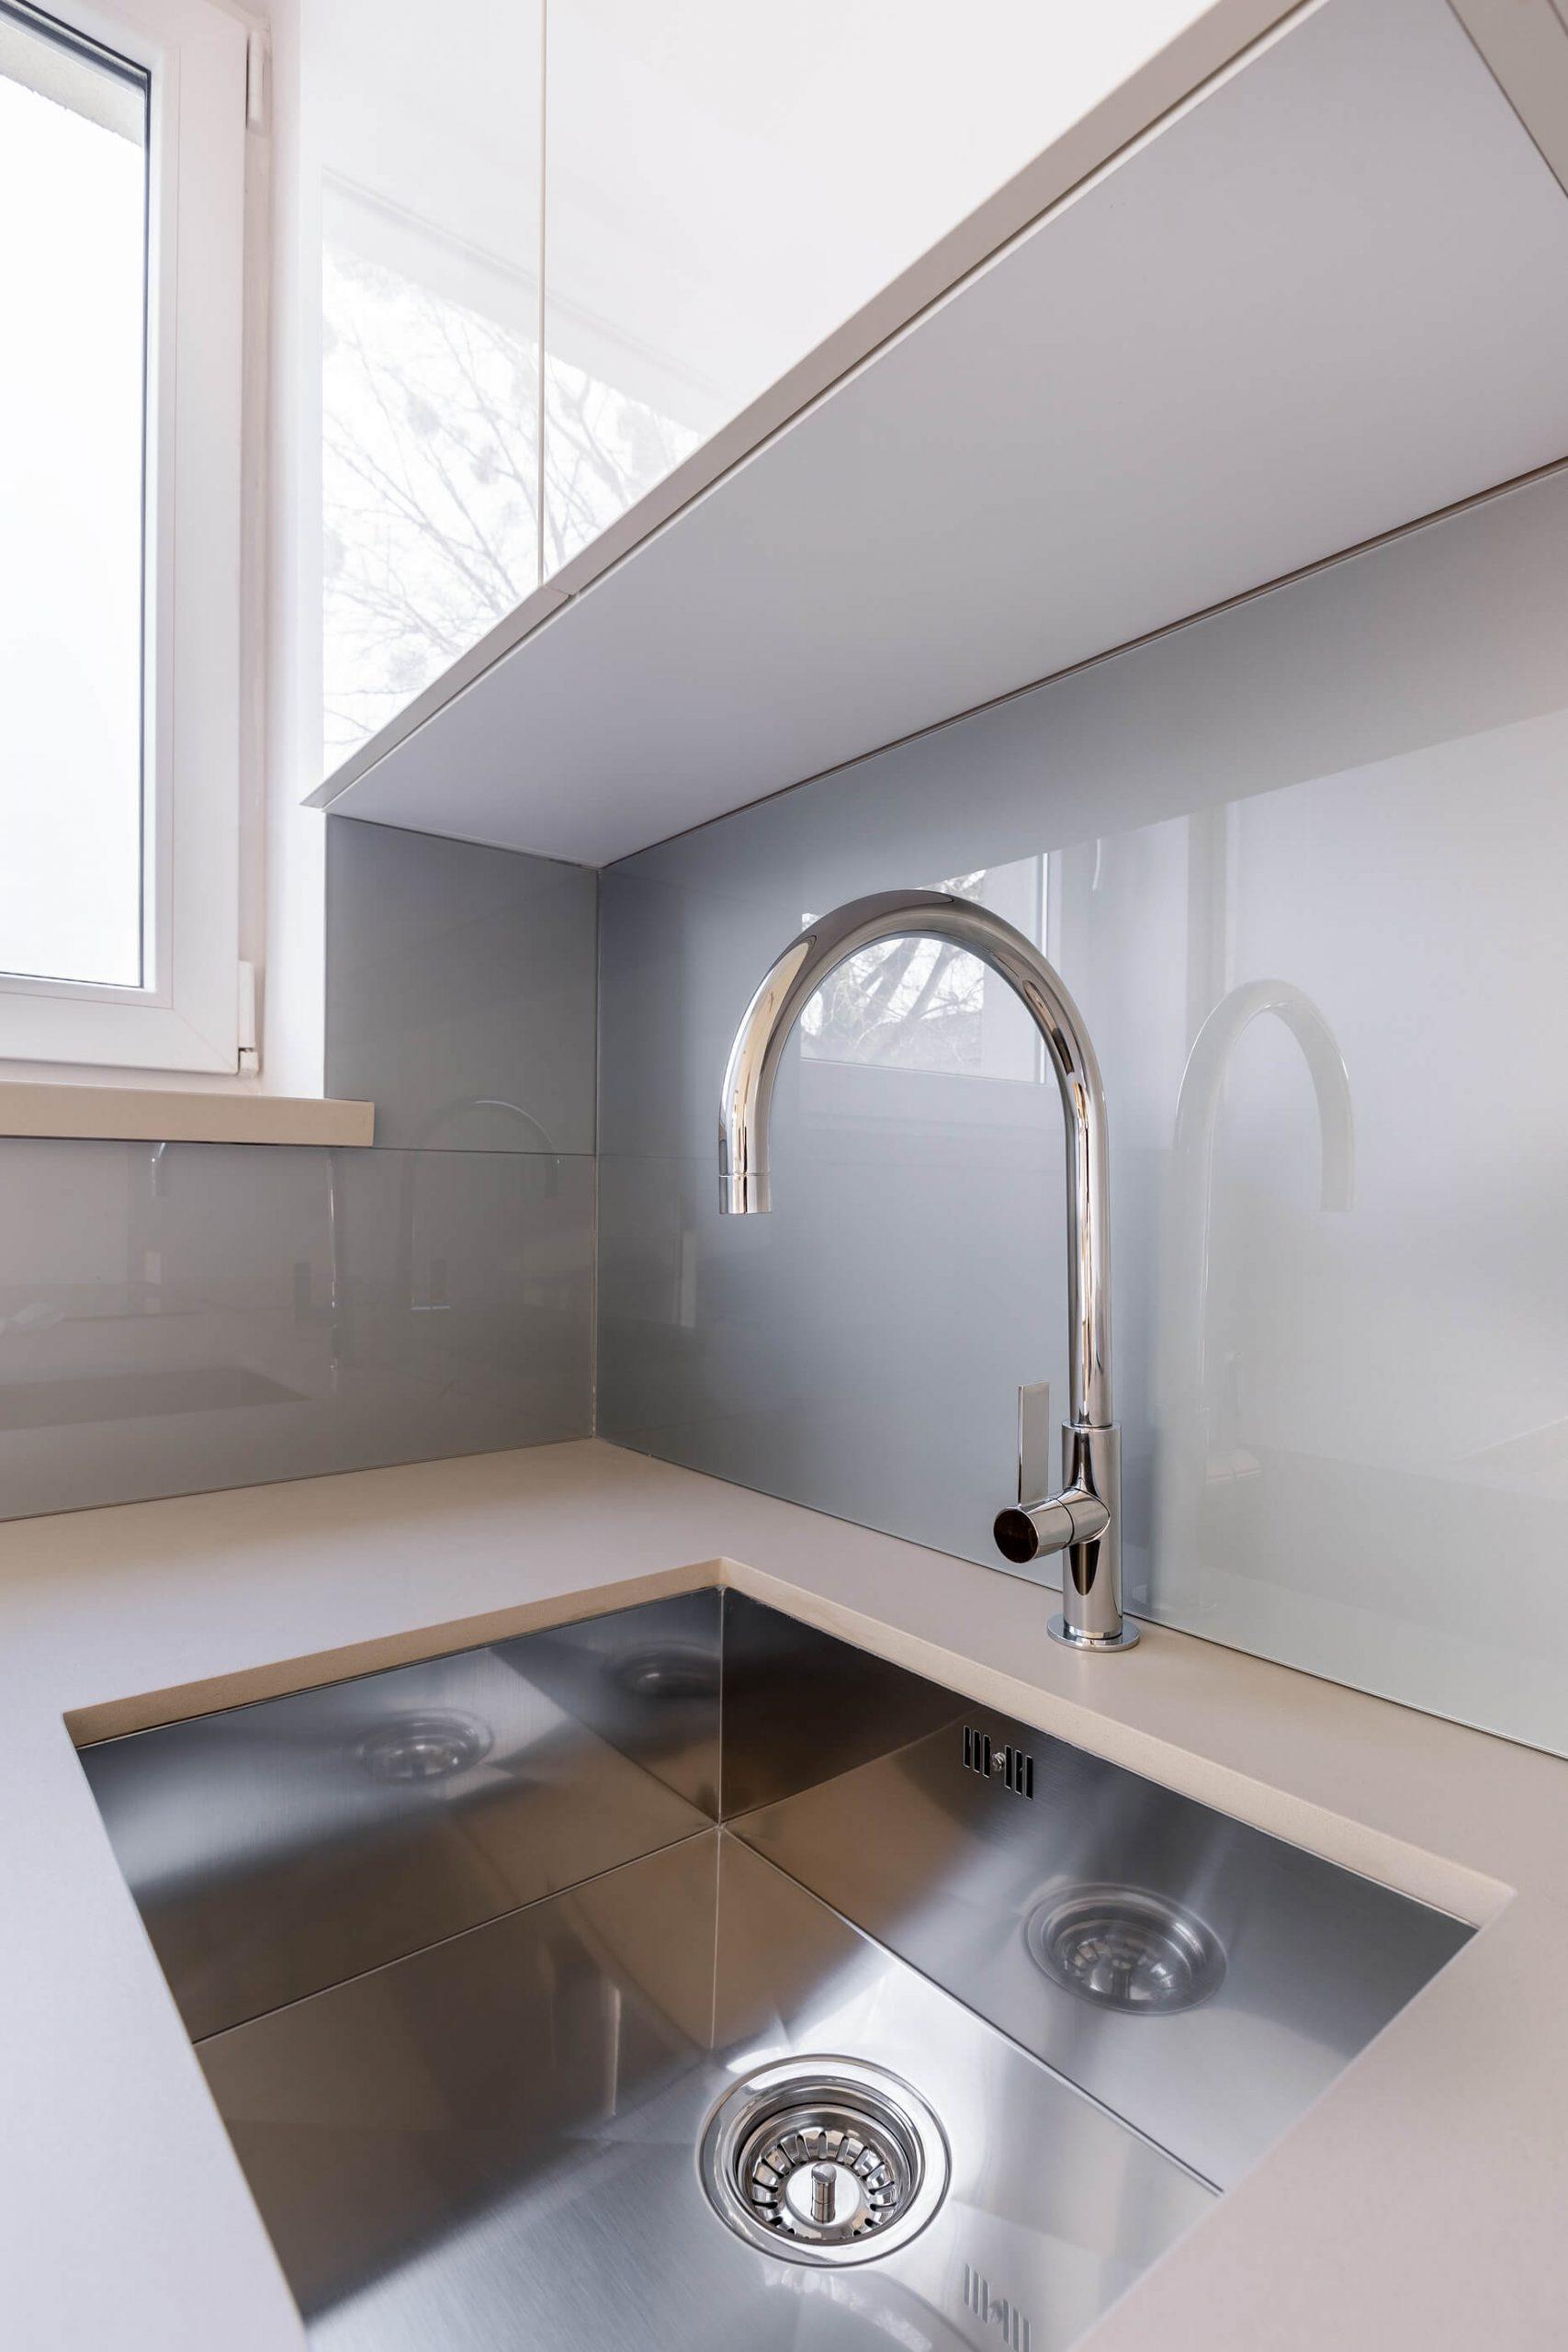 Picture of kitchen backsplash and sink